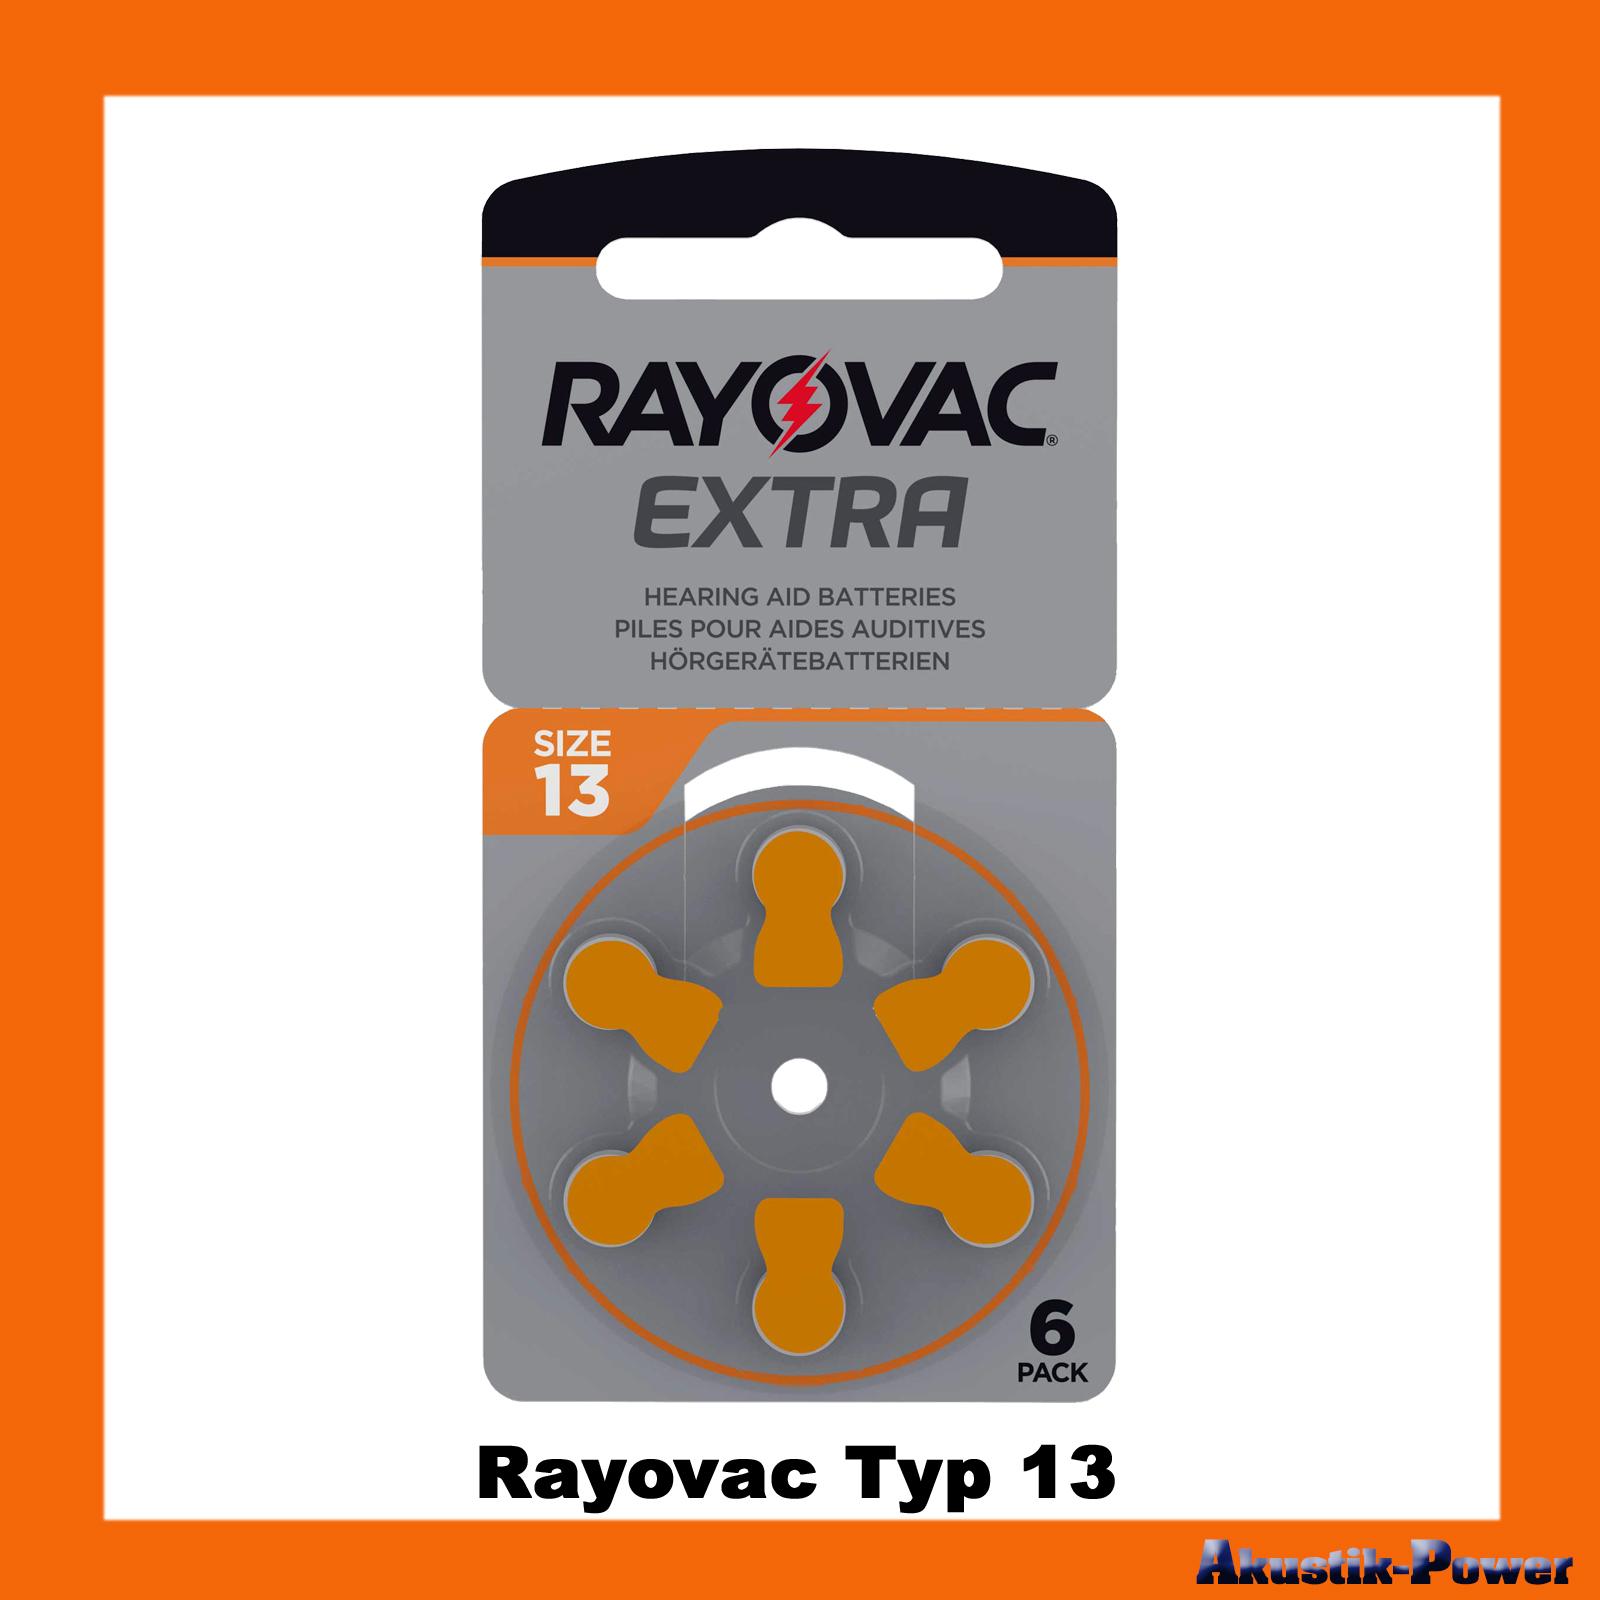 akustik power rayovac typ 13 pr48 h rger te batterien online kaufen. Black Bedroom Furniture Sets. Home Design Ideas